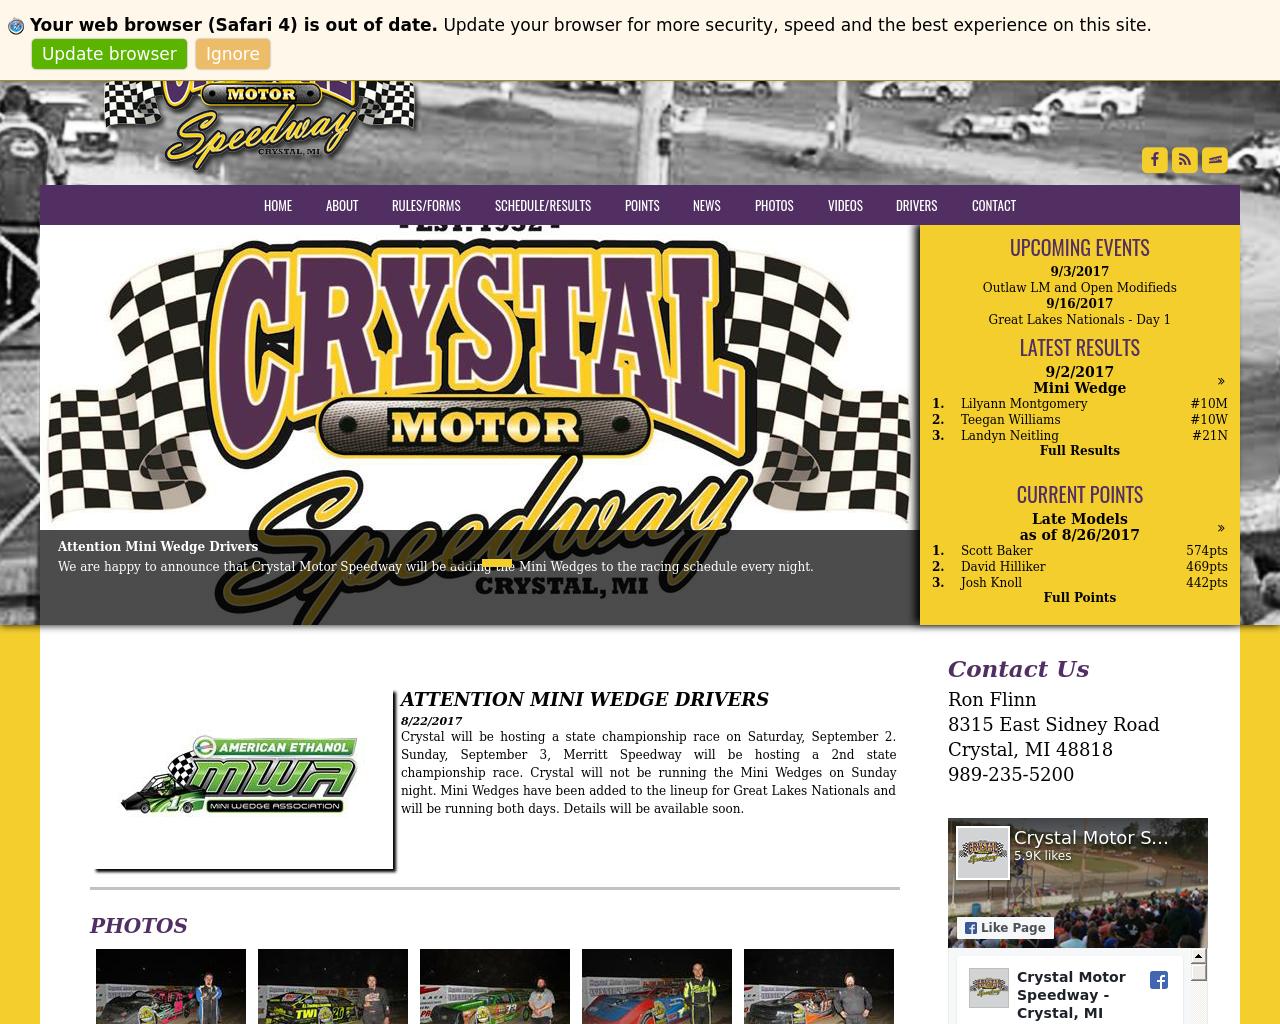 CMS-Crystal-Motor-Speedway-Advertising-Reviews-Pricing